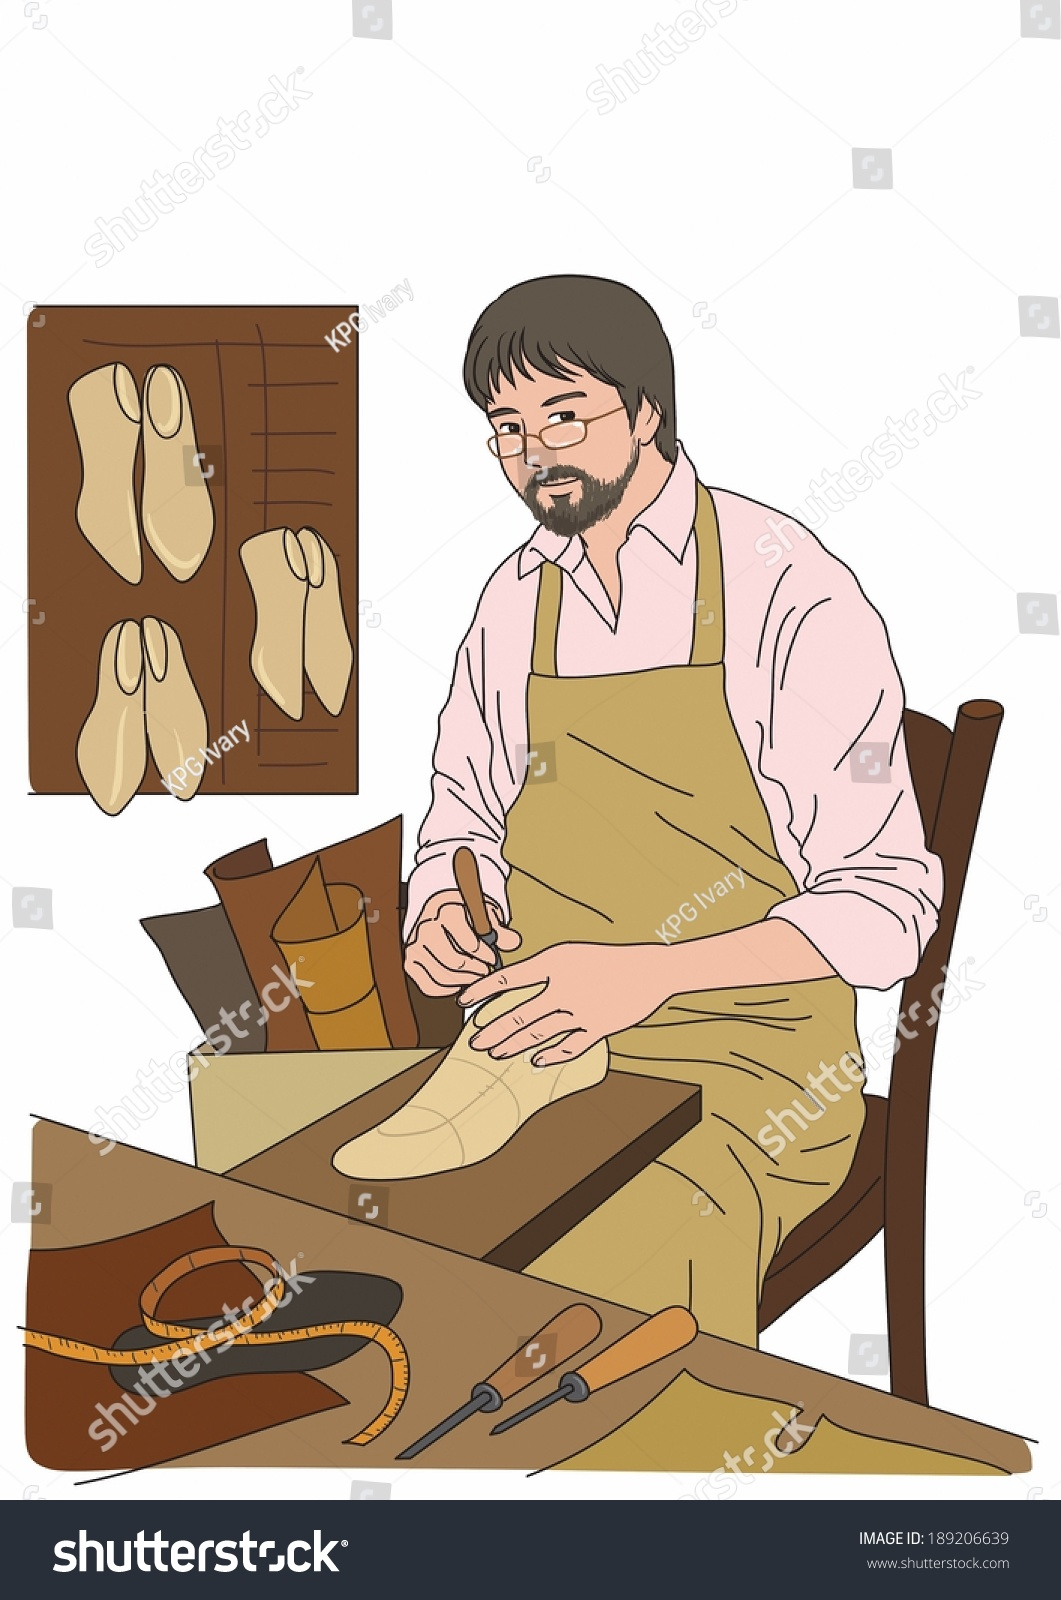 Illustration Cobbler Stock Illustration 189206639 - Shutterstock